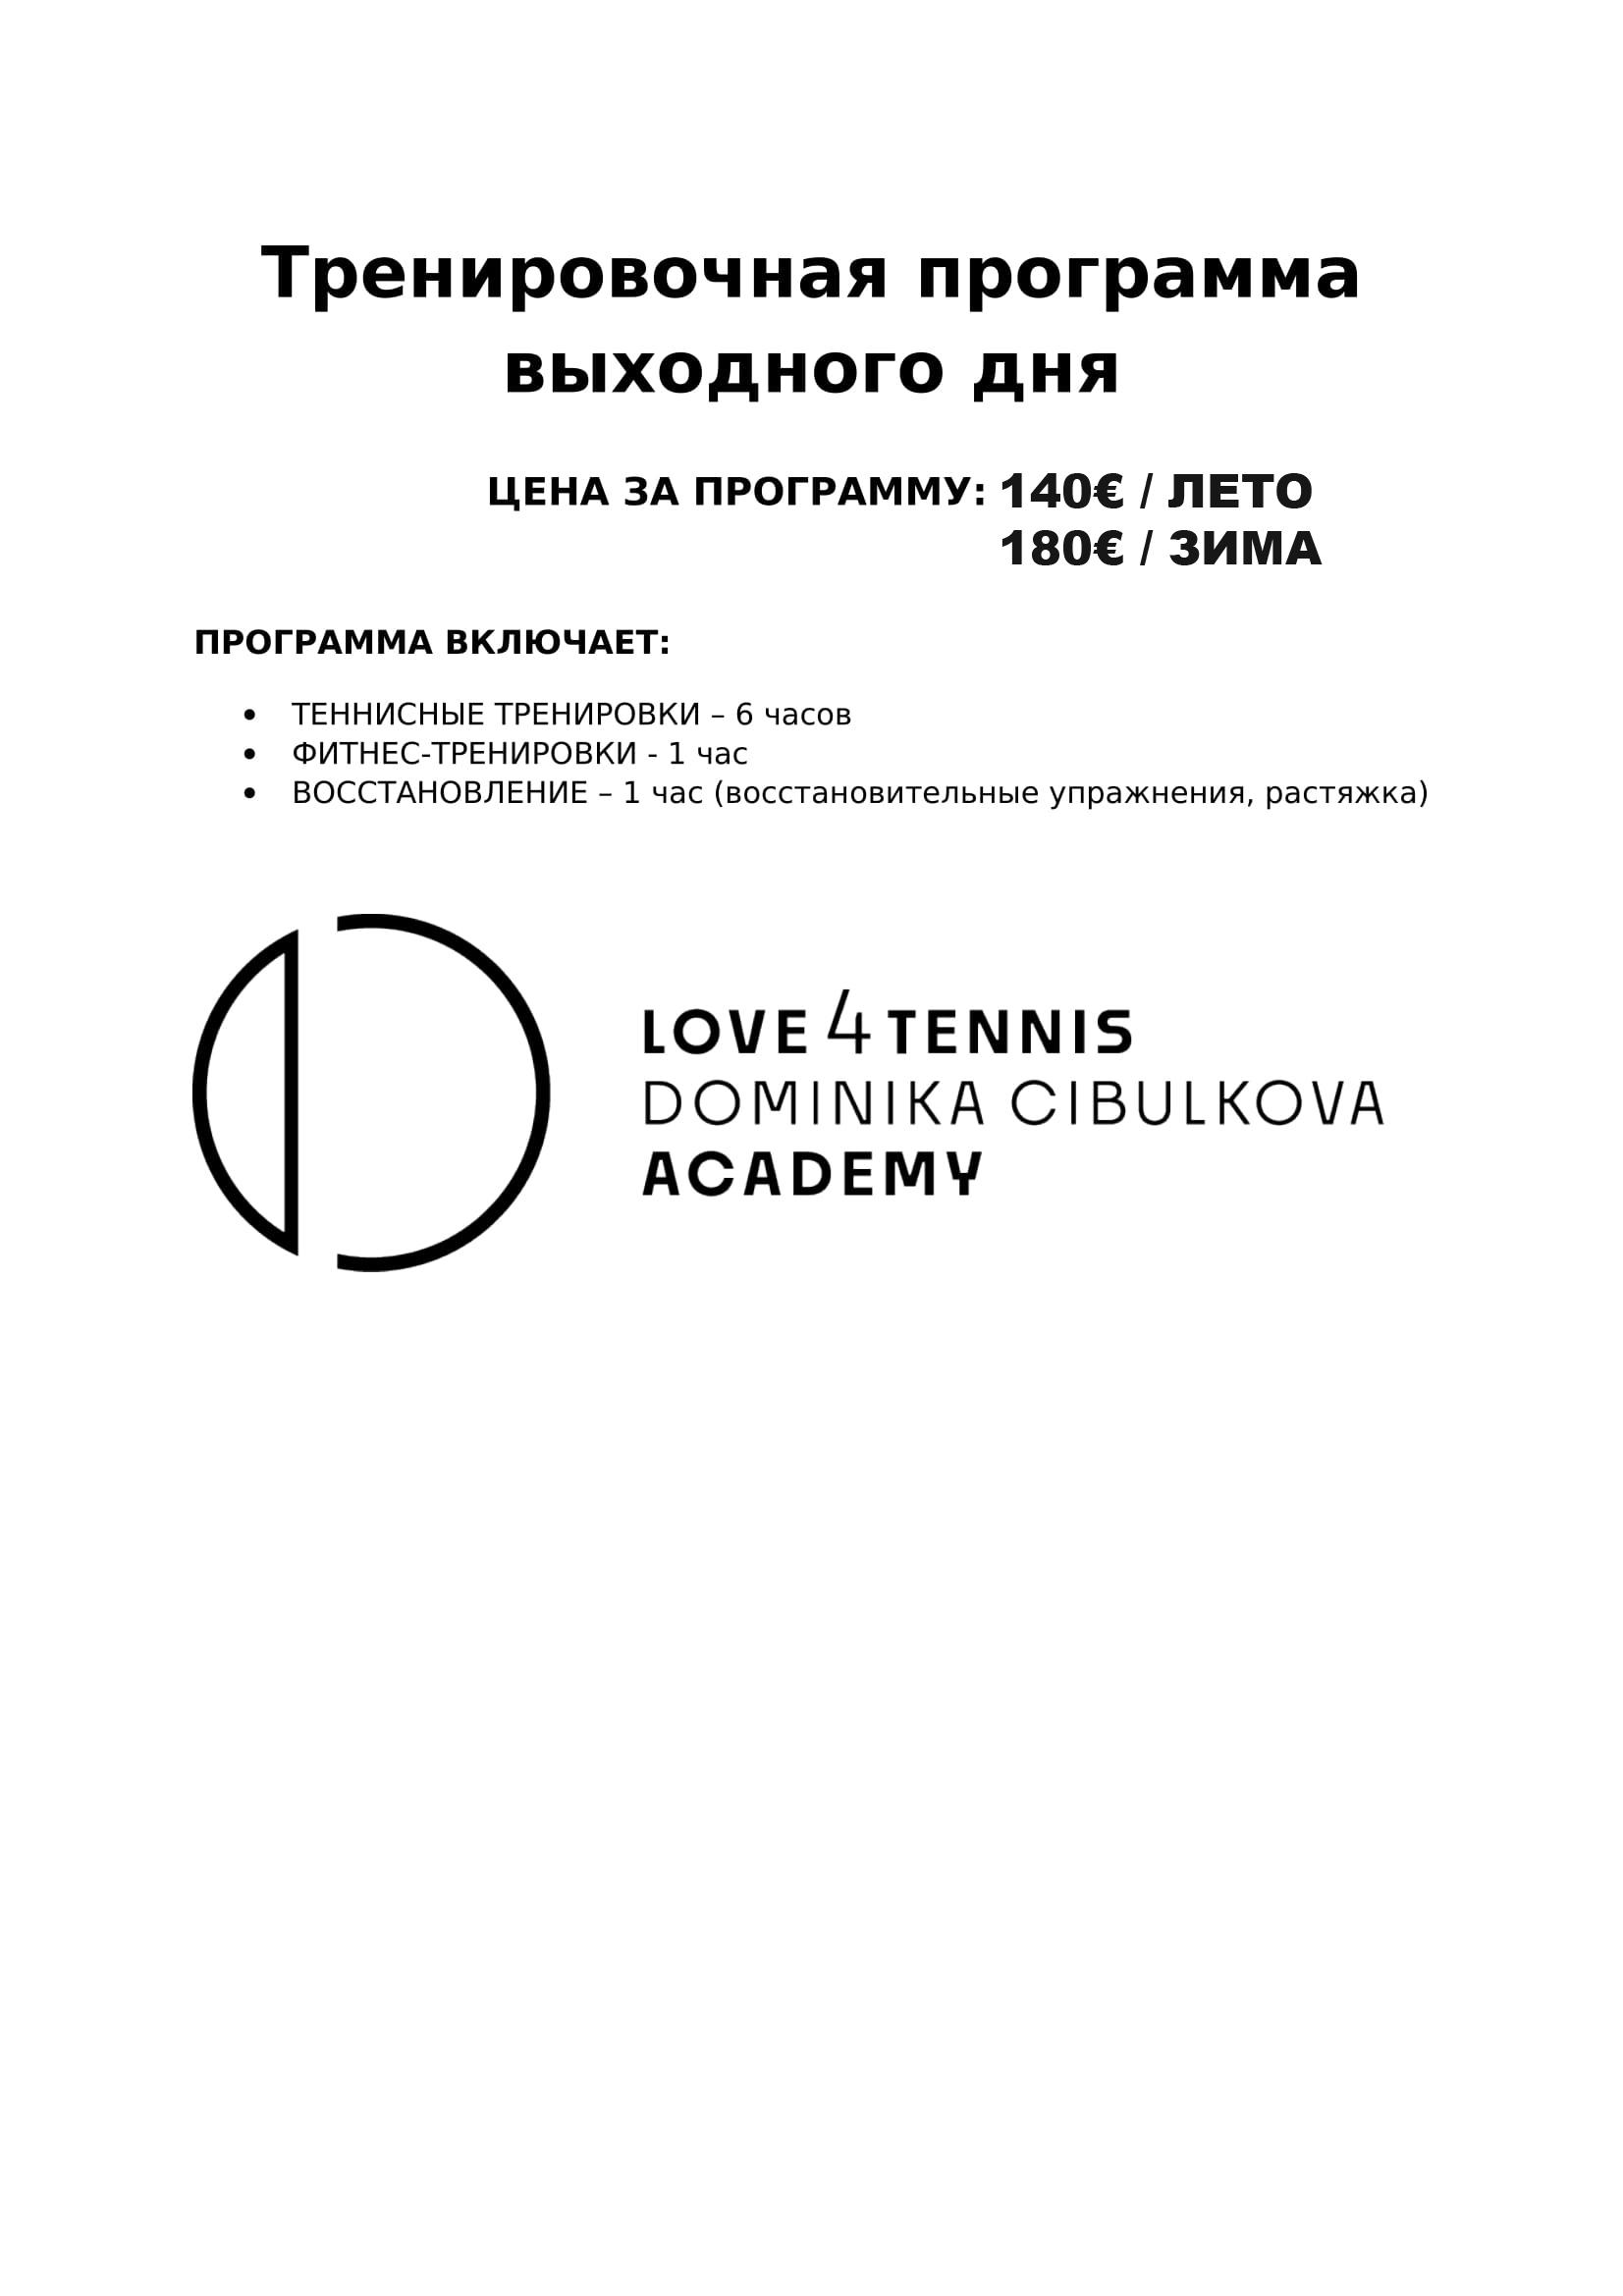 WEEKEND TRAINING PROGRAM - rus-1